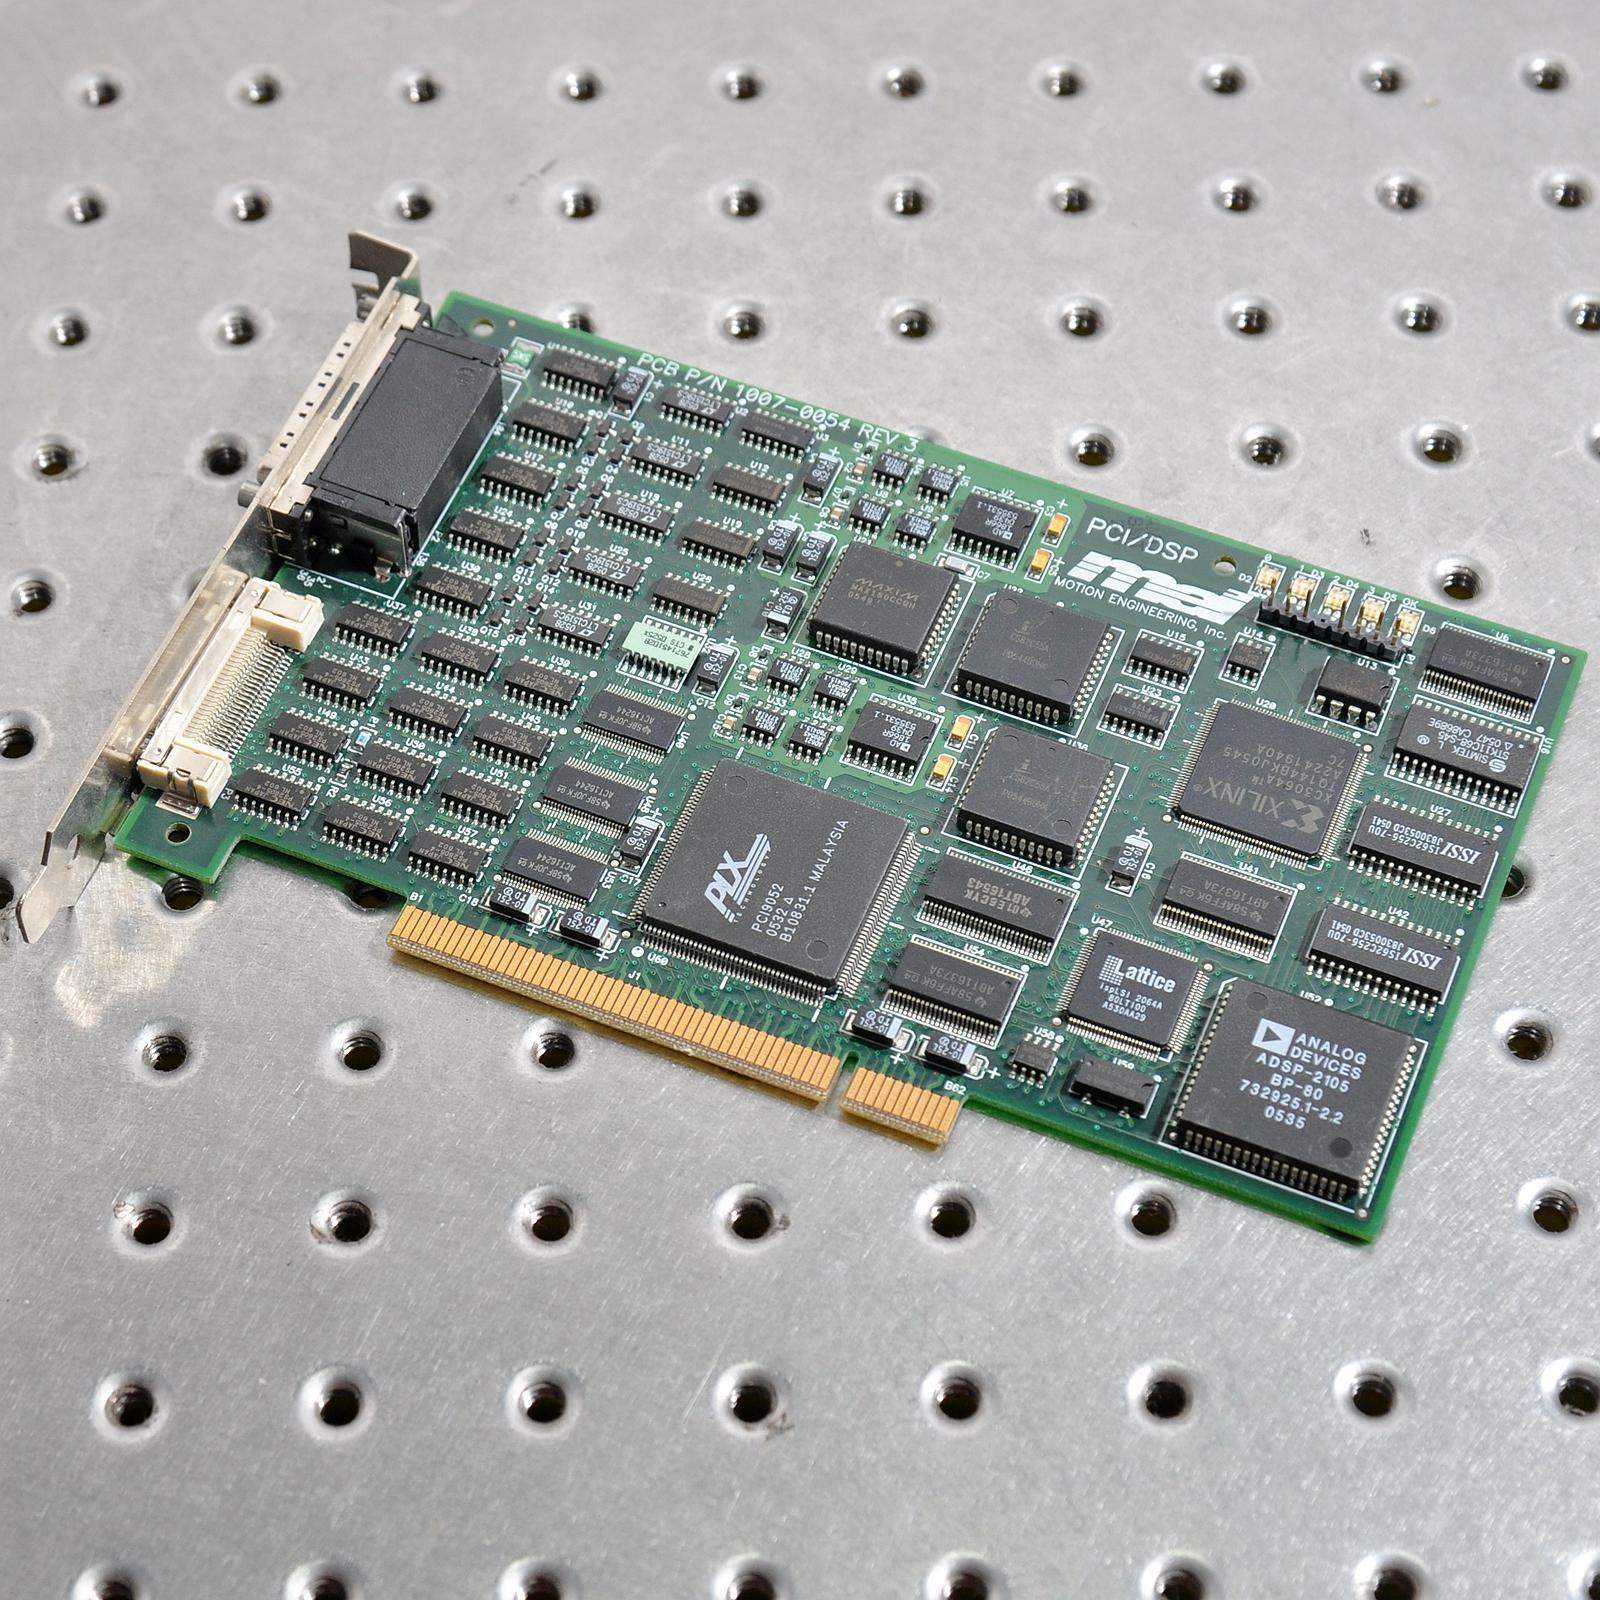 MEI PCI/DSP PCB P/N 1007-0054 REV.3 Servo card of motion control card